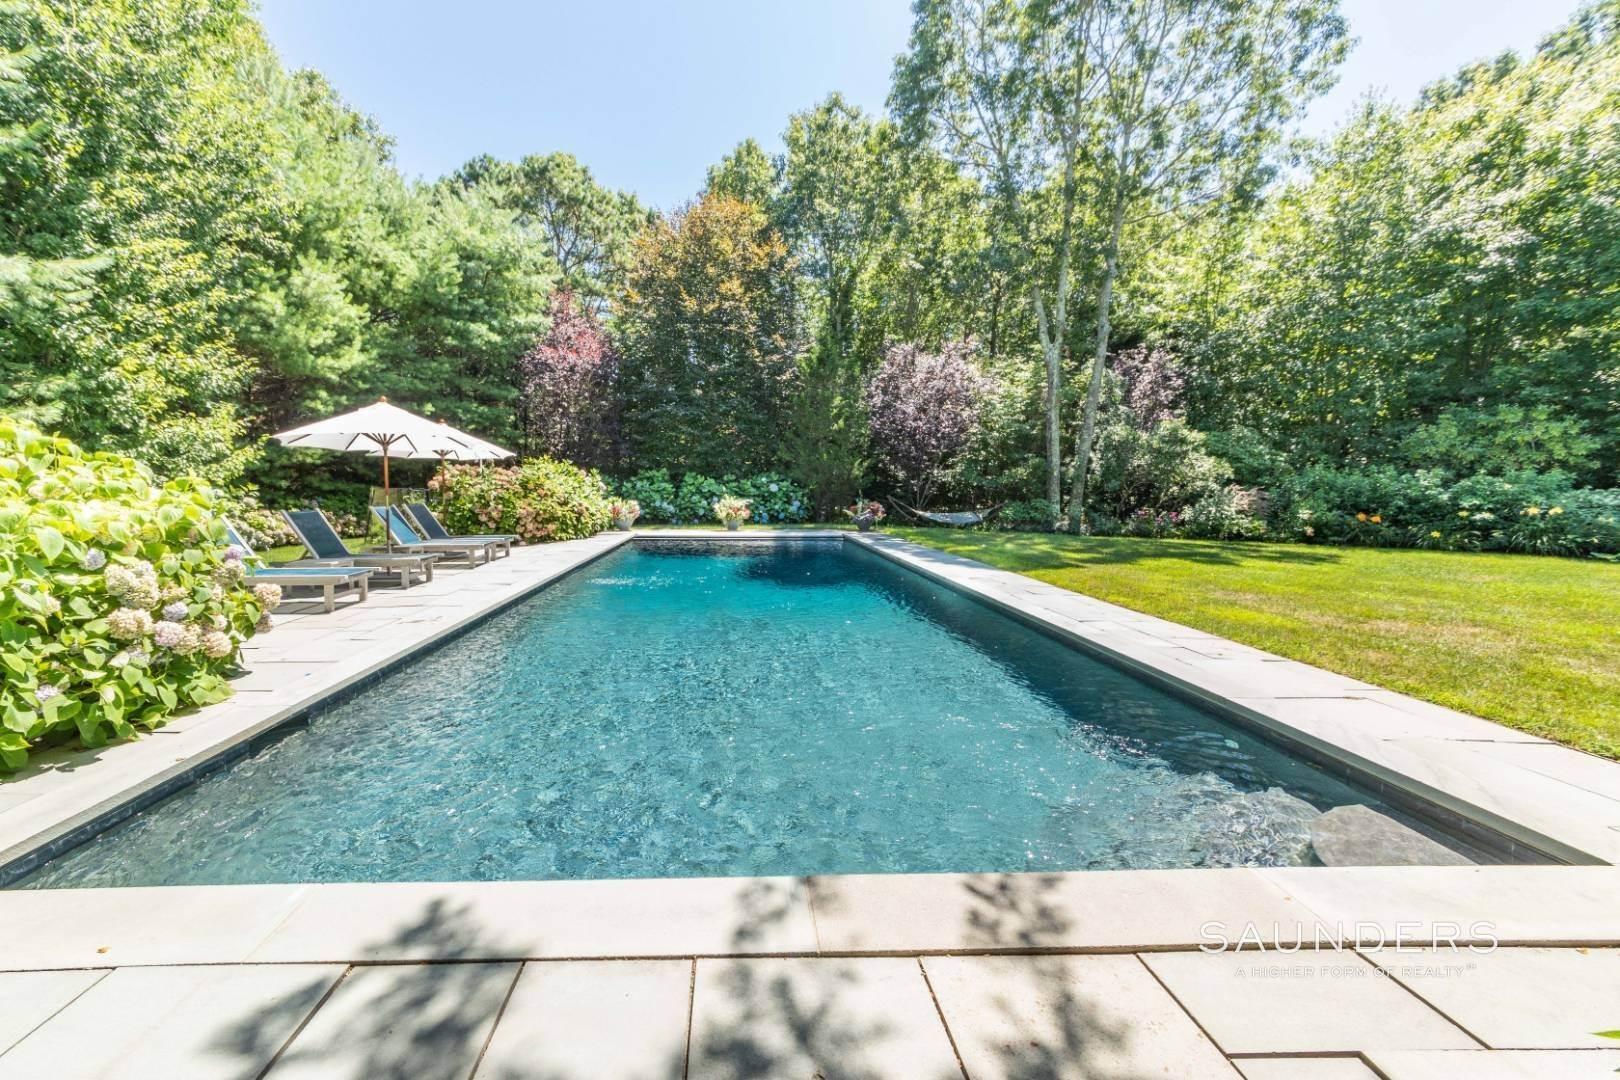 23. Single Family Homes for Sale at Wainscott South Traditional Near Beach Lane 10 Merriwood Drive, Wainscott, East Hampton Town, NY 11975